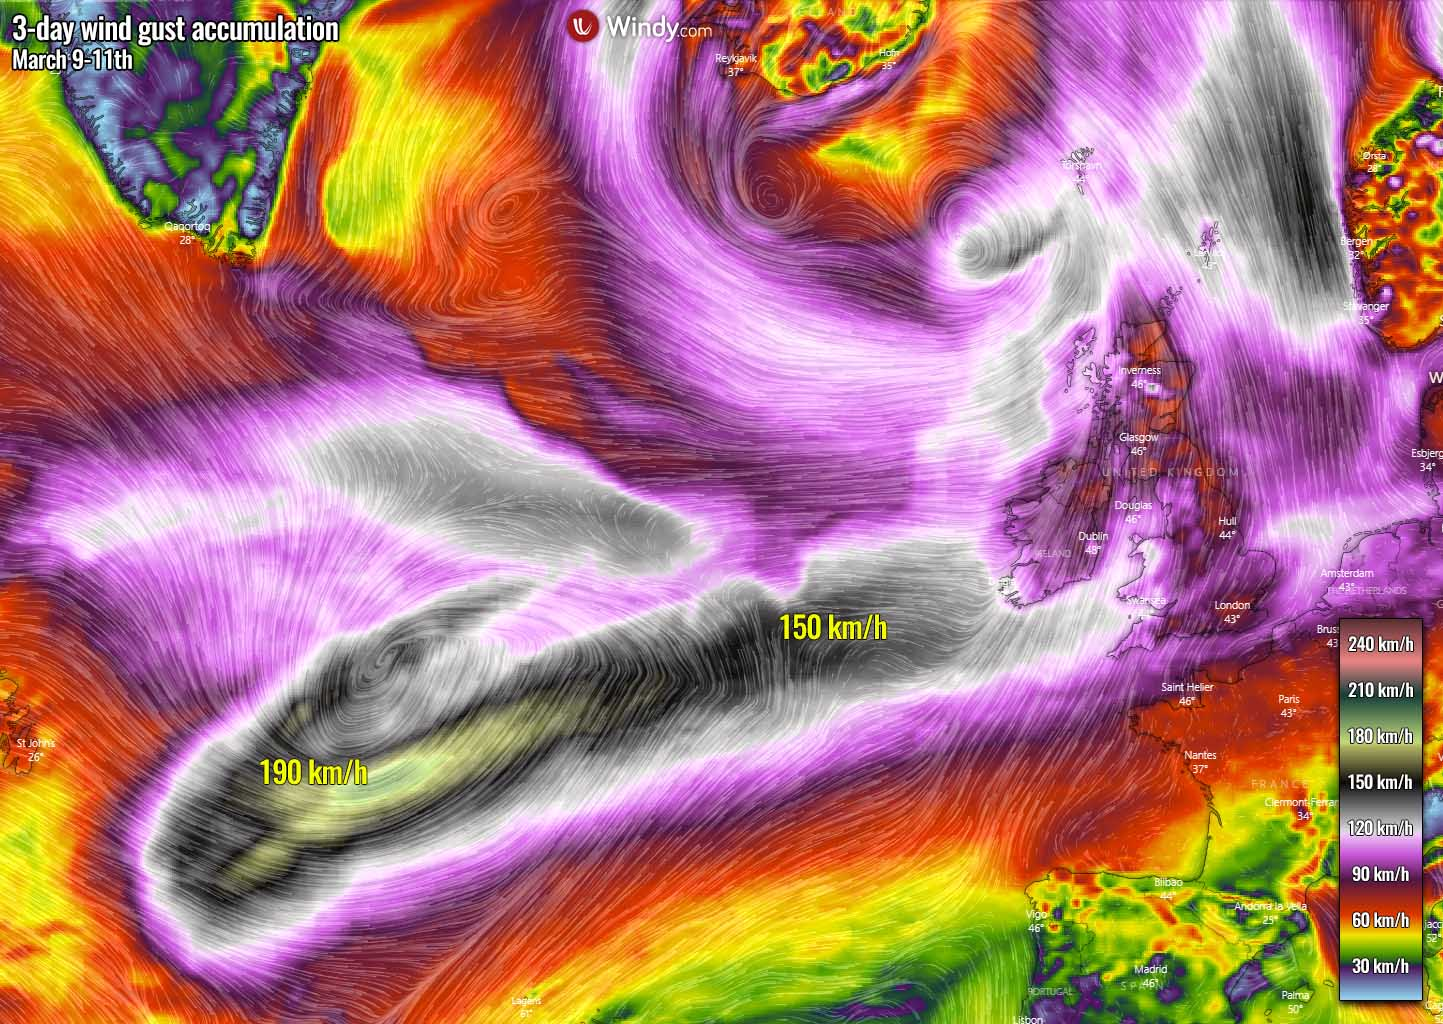 north-atlantic-nao-index-storm-wind-accumulation